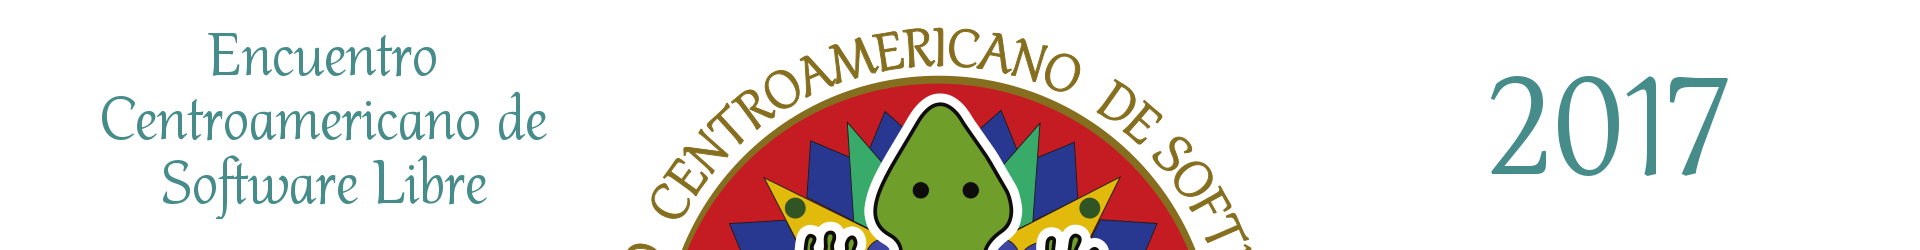 Encuentro Centroamericano de Software Libre 2017